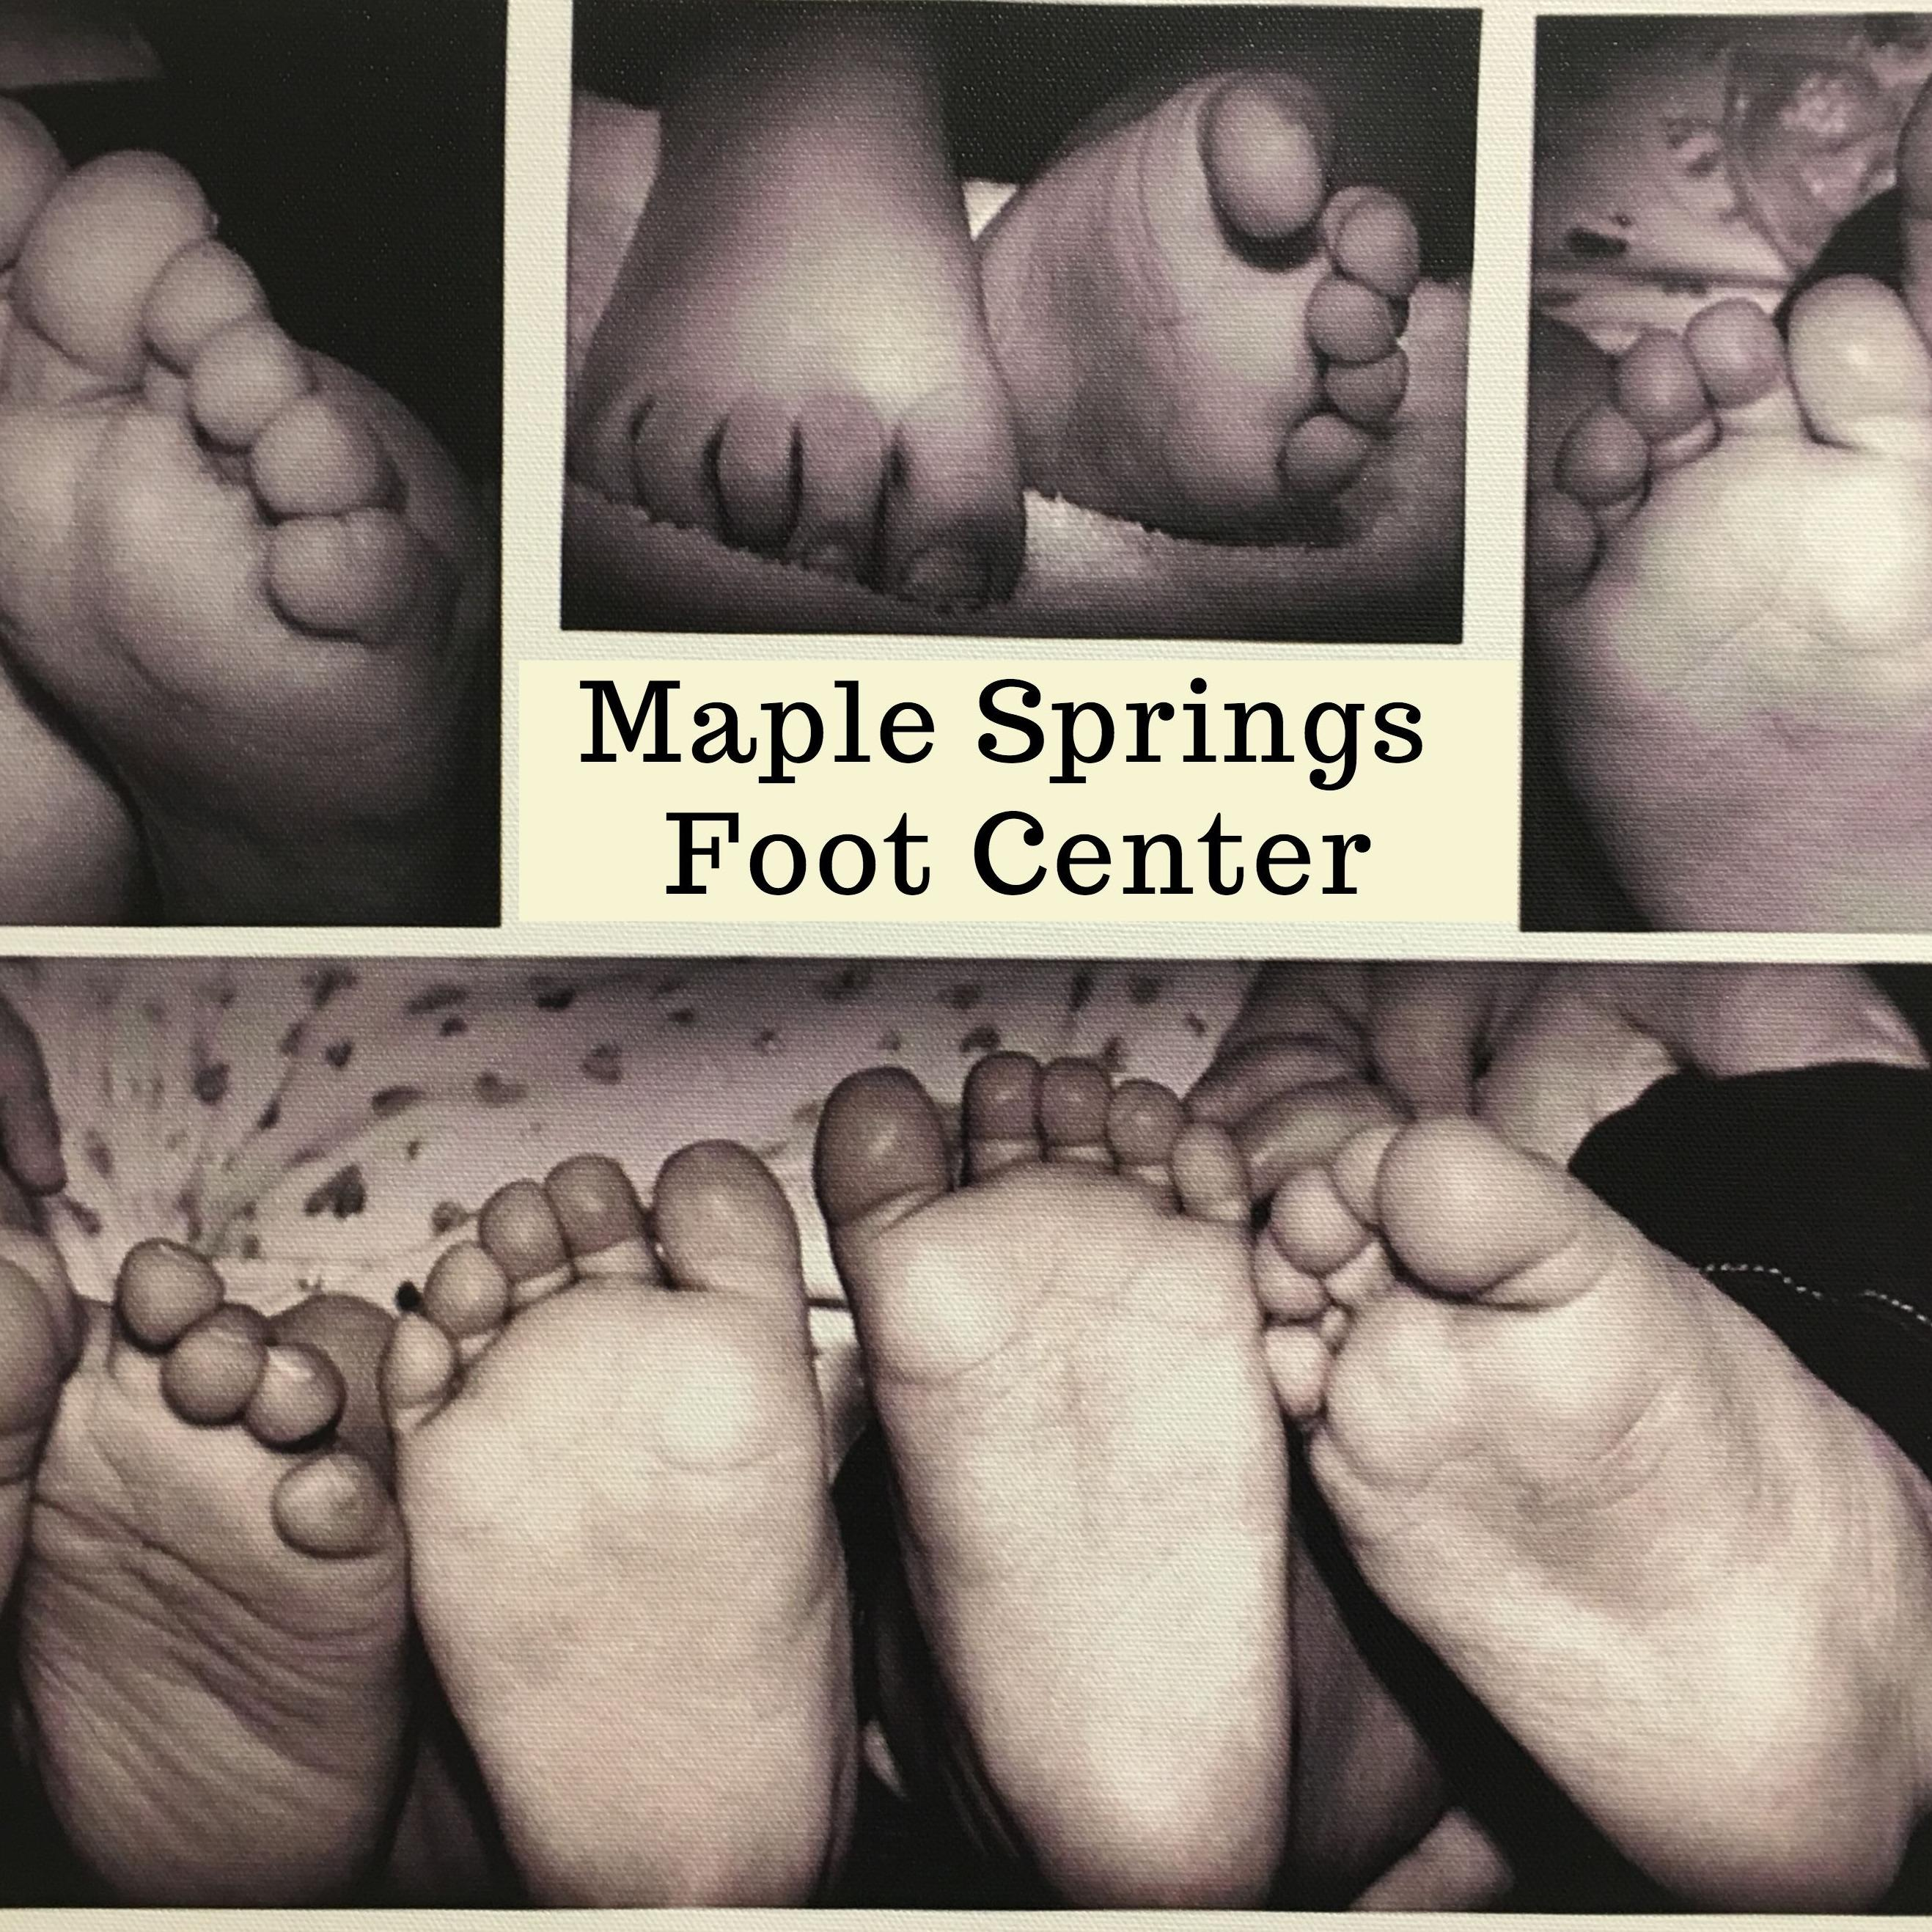 Maple Springs Foot Center